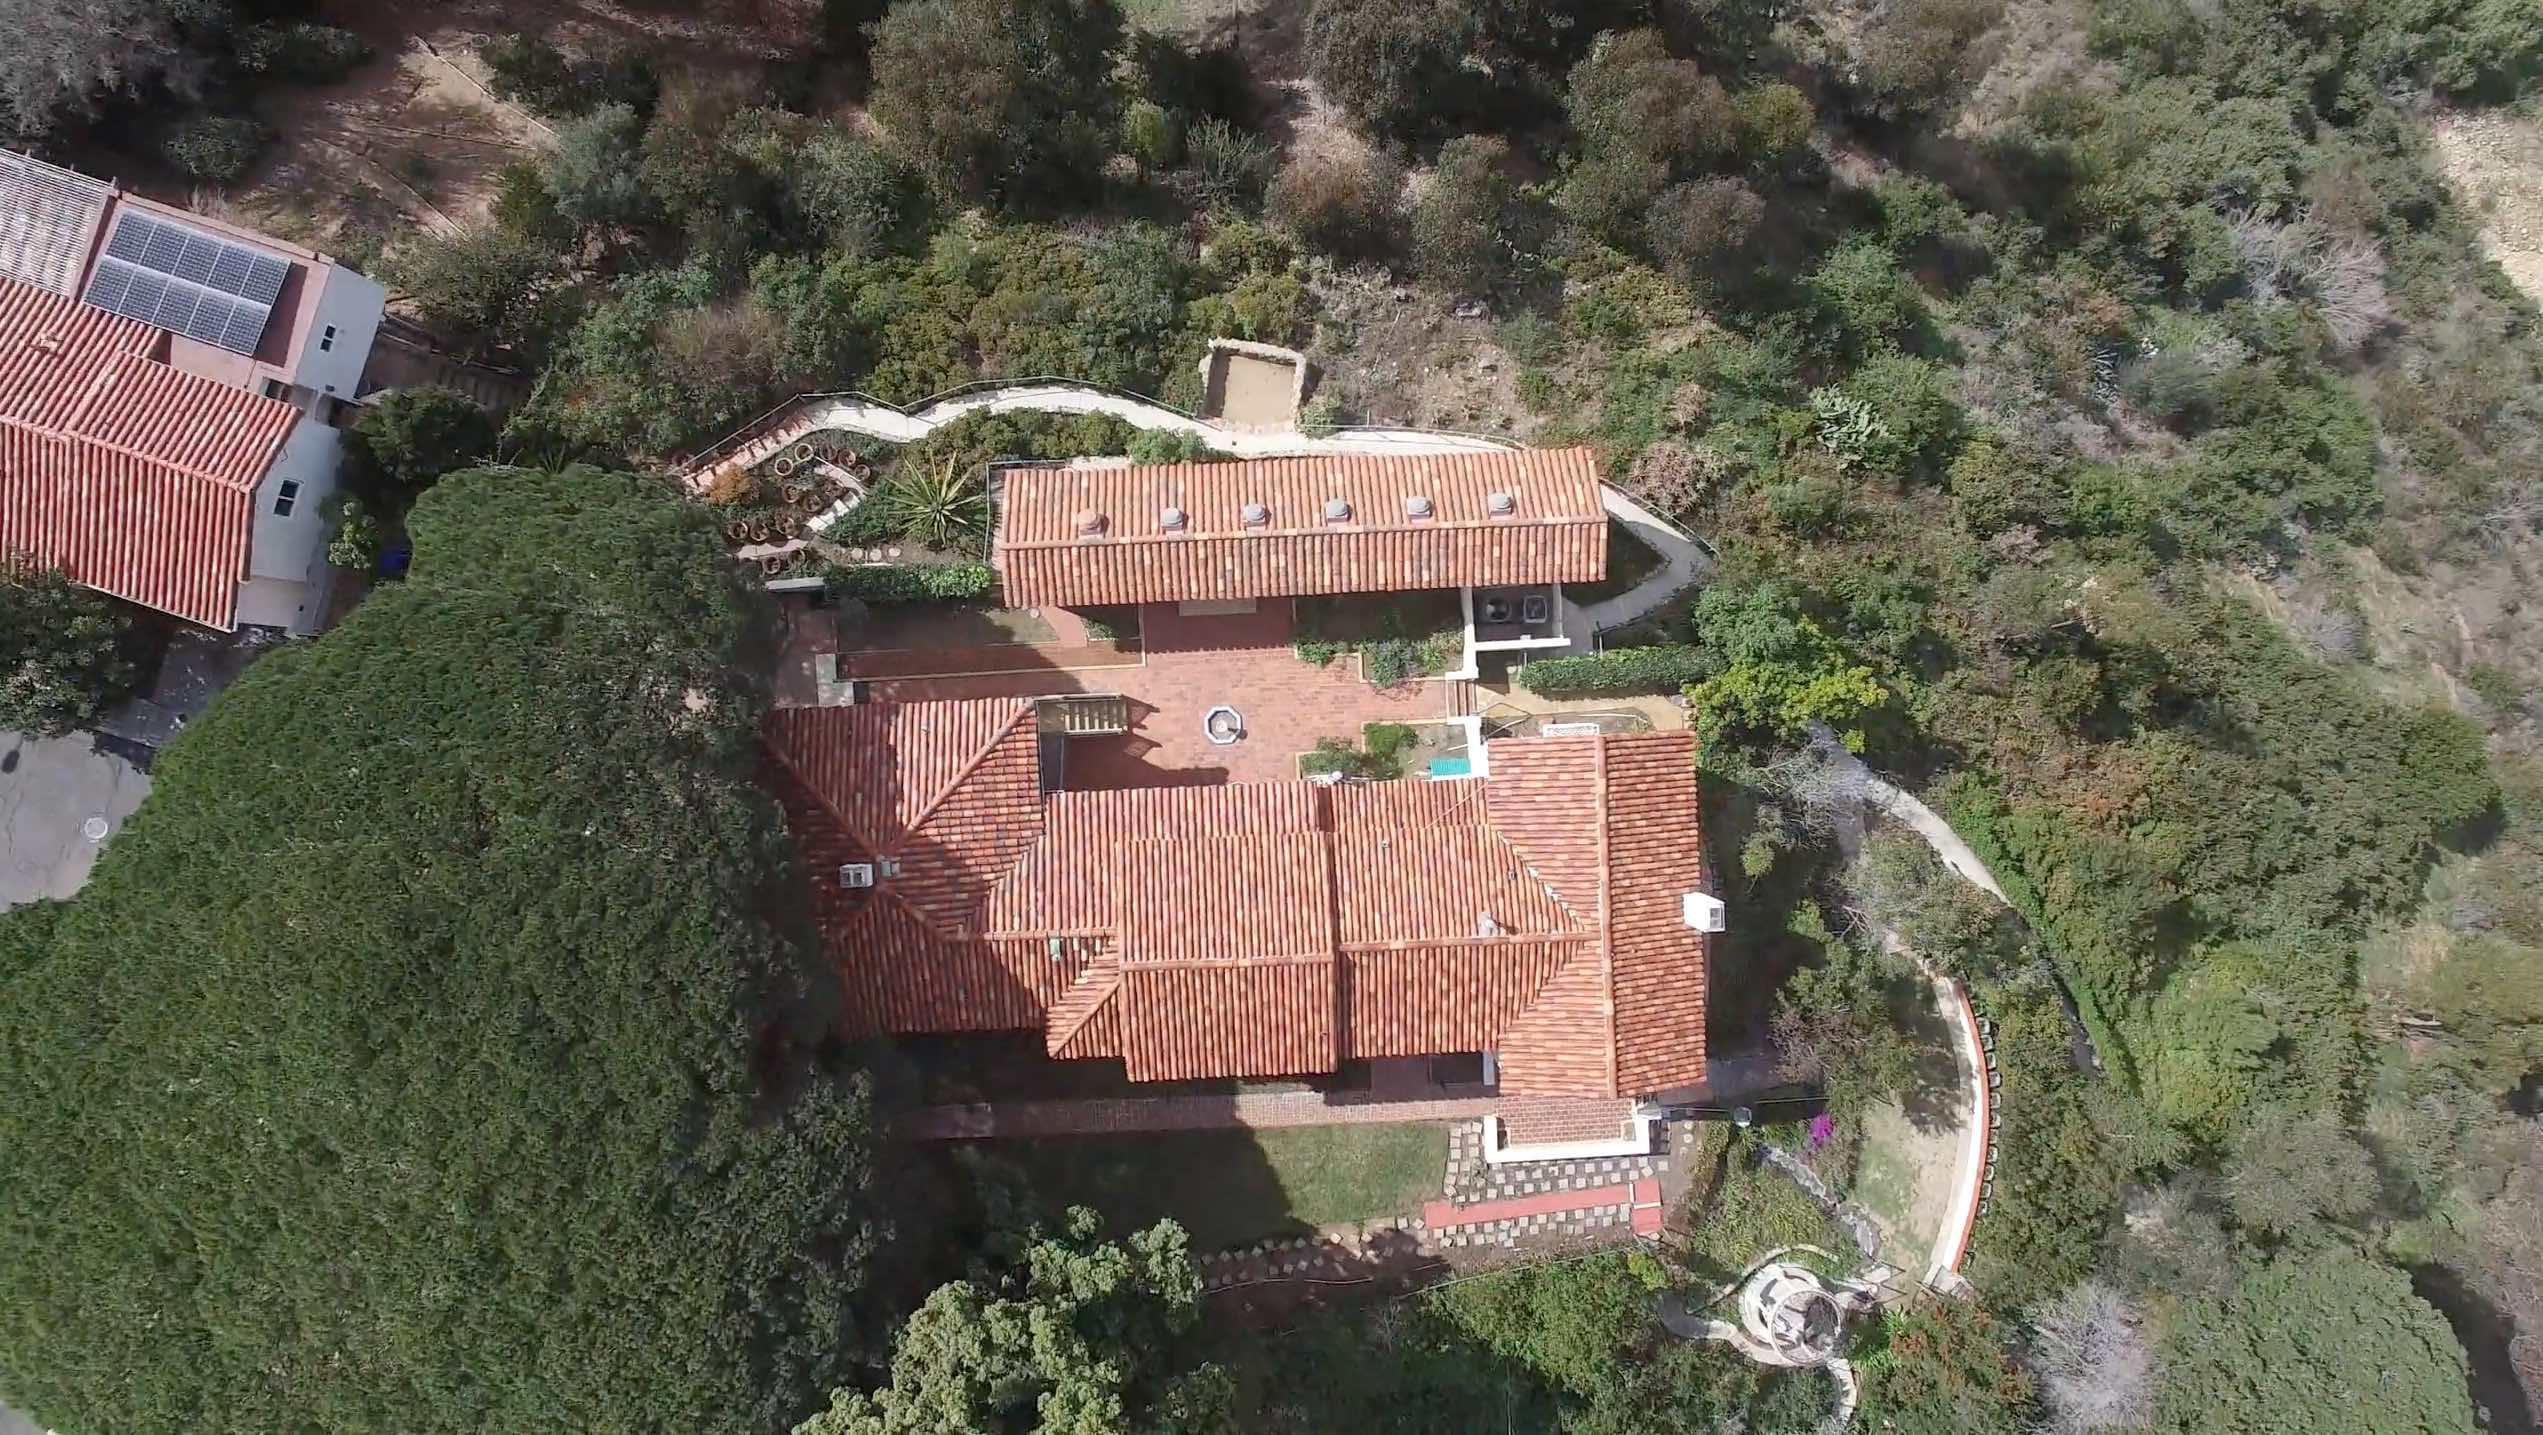 Villa-Hermosa-Aerial-2